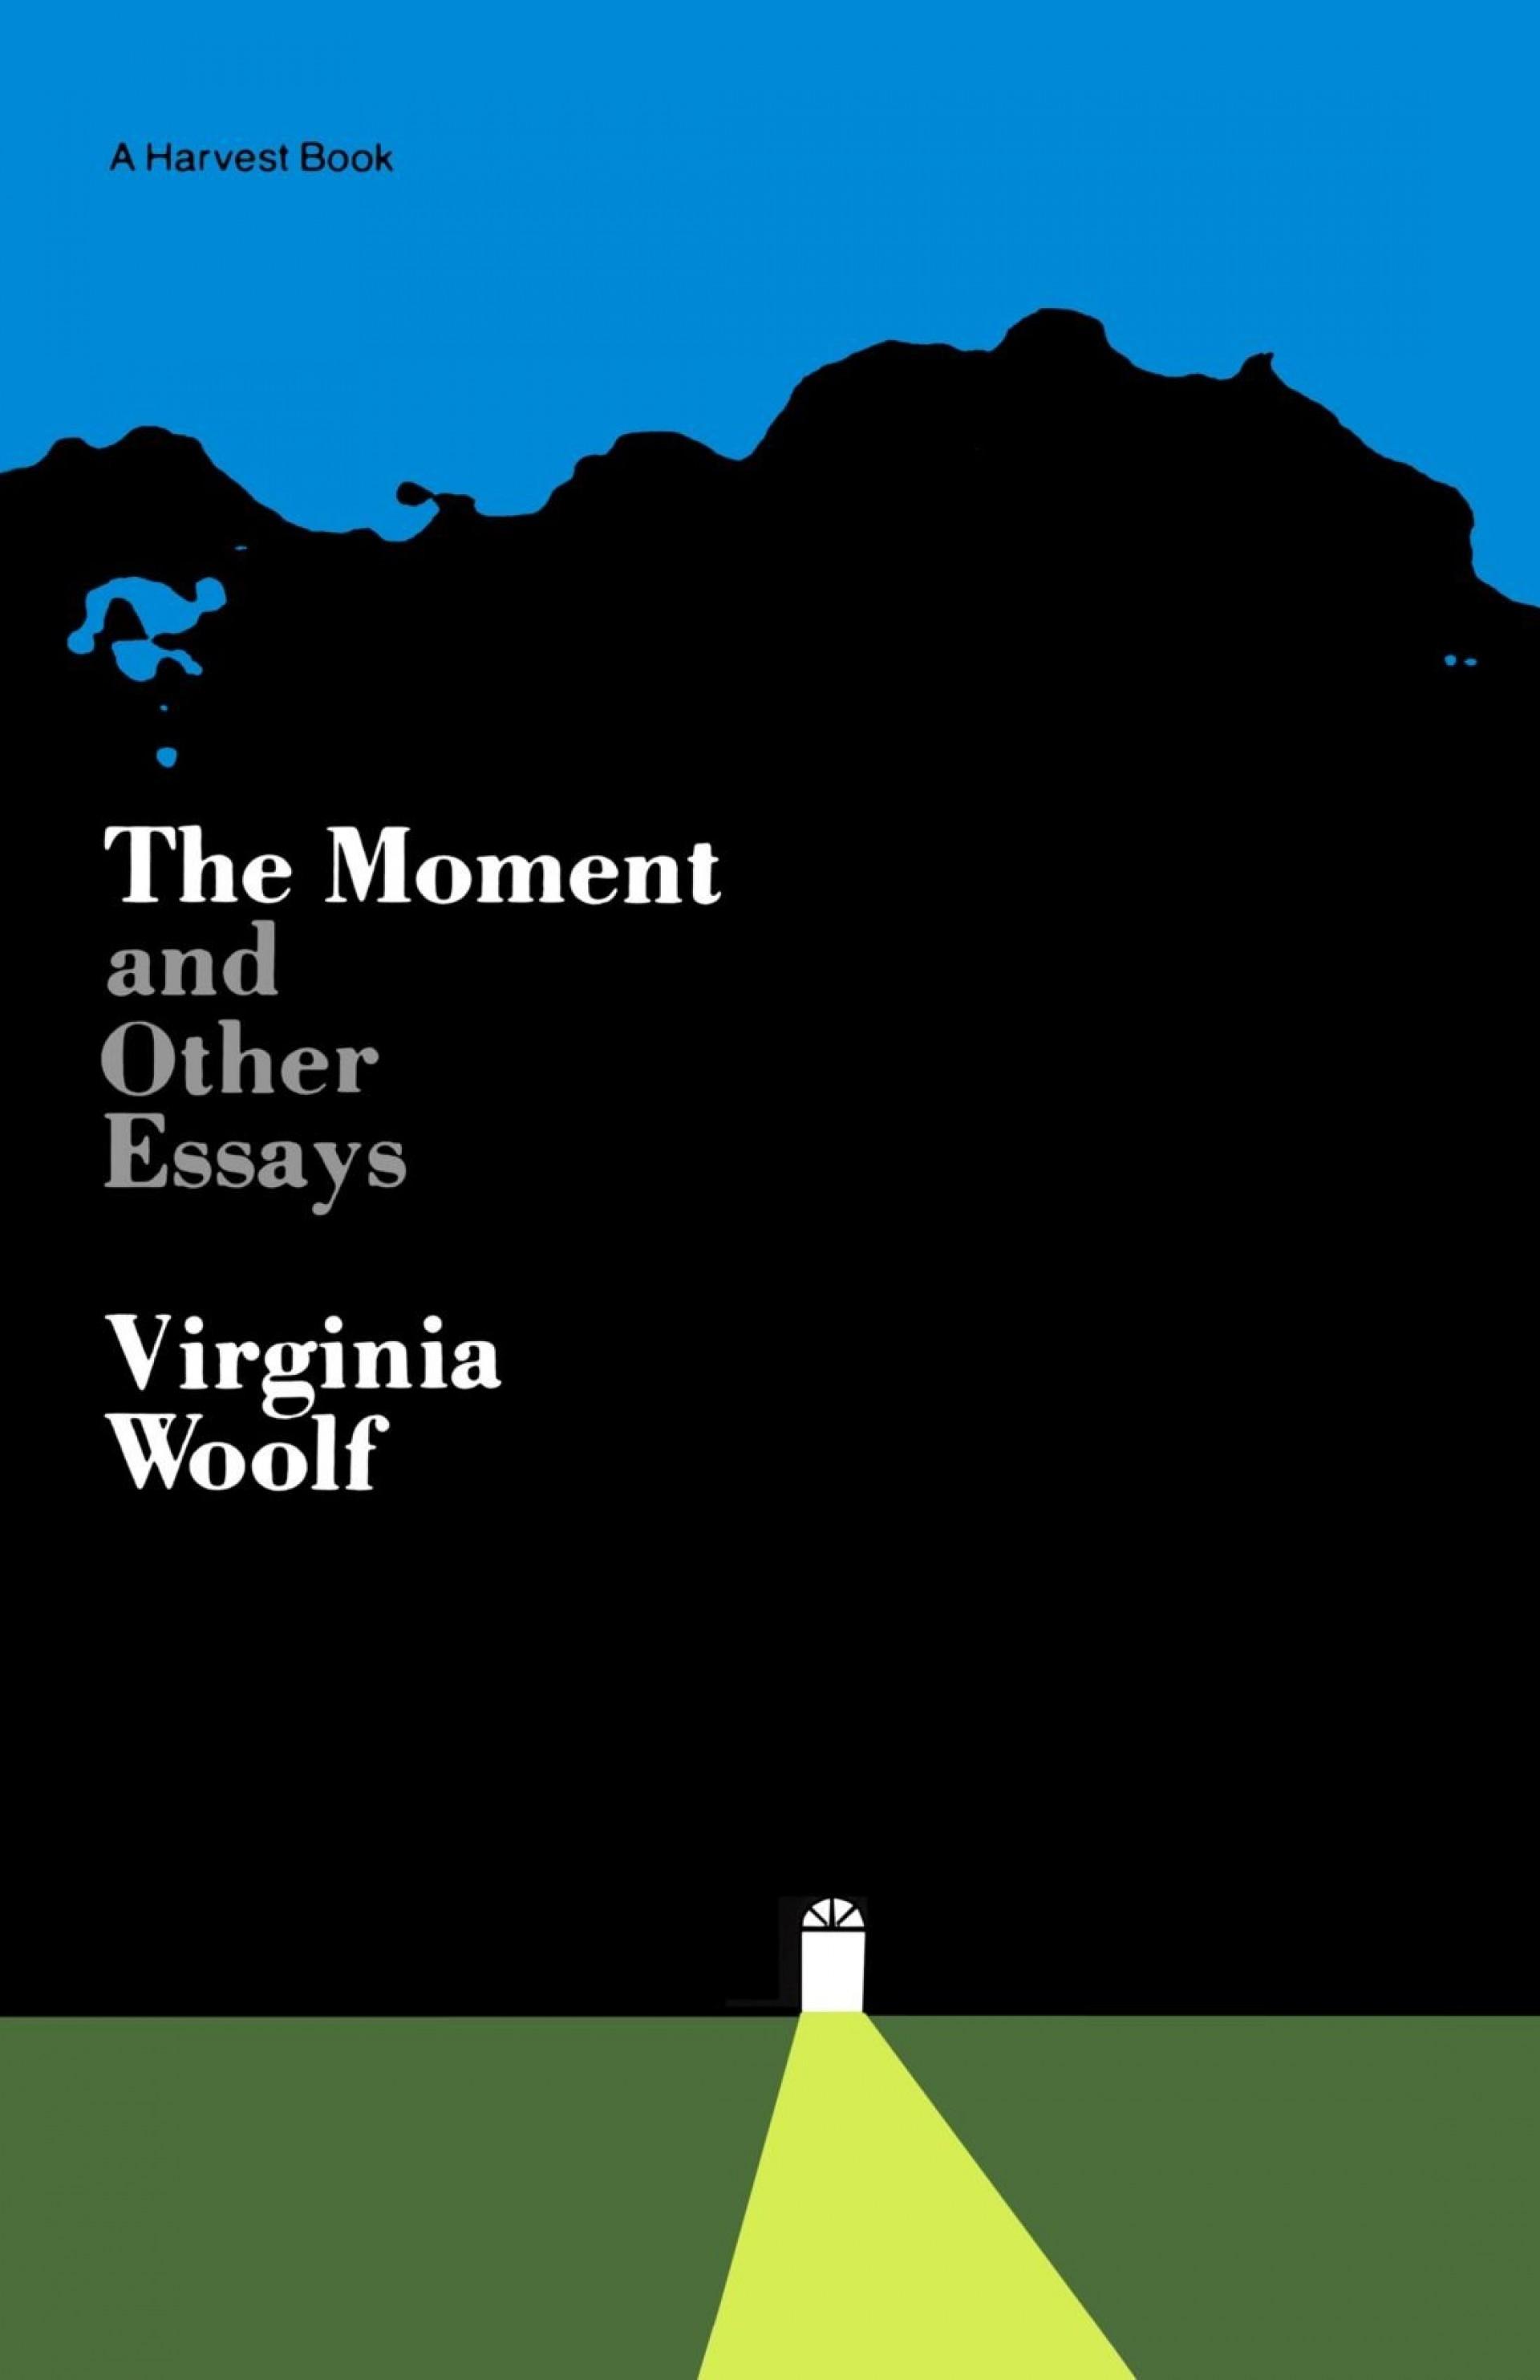 011 Virginia Woolf Essays Gs8rmzl Essay Unusual Online The Modern Analysis On Self 1920